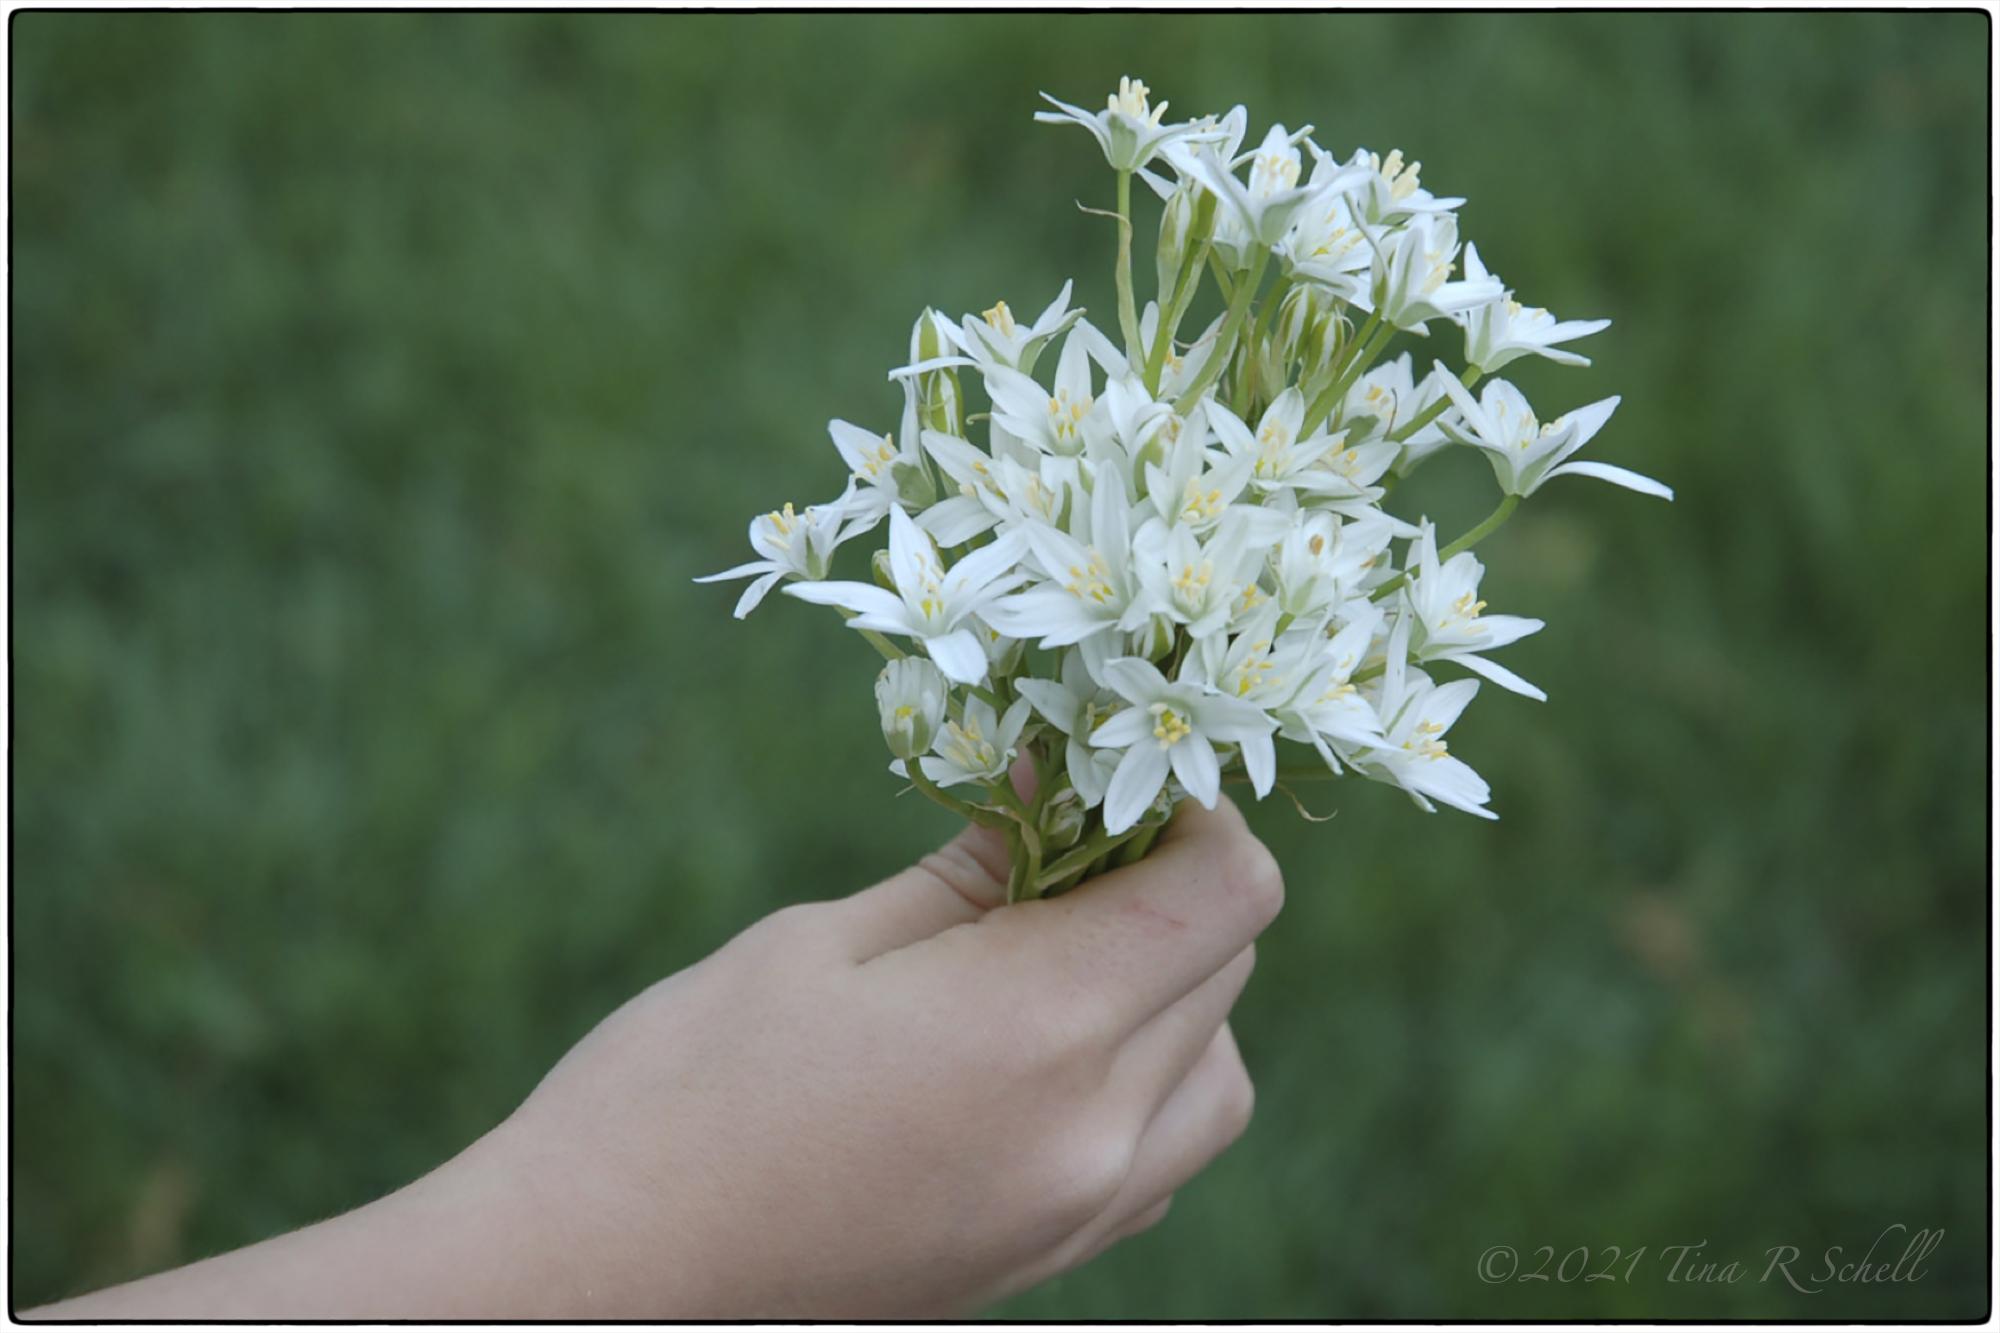 flowers, hand